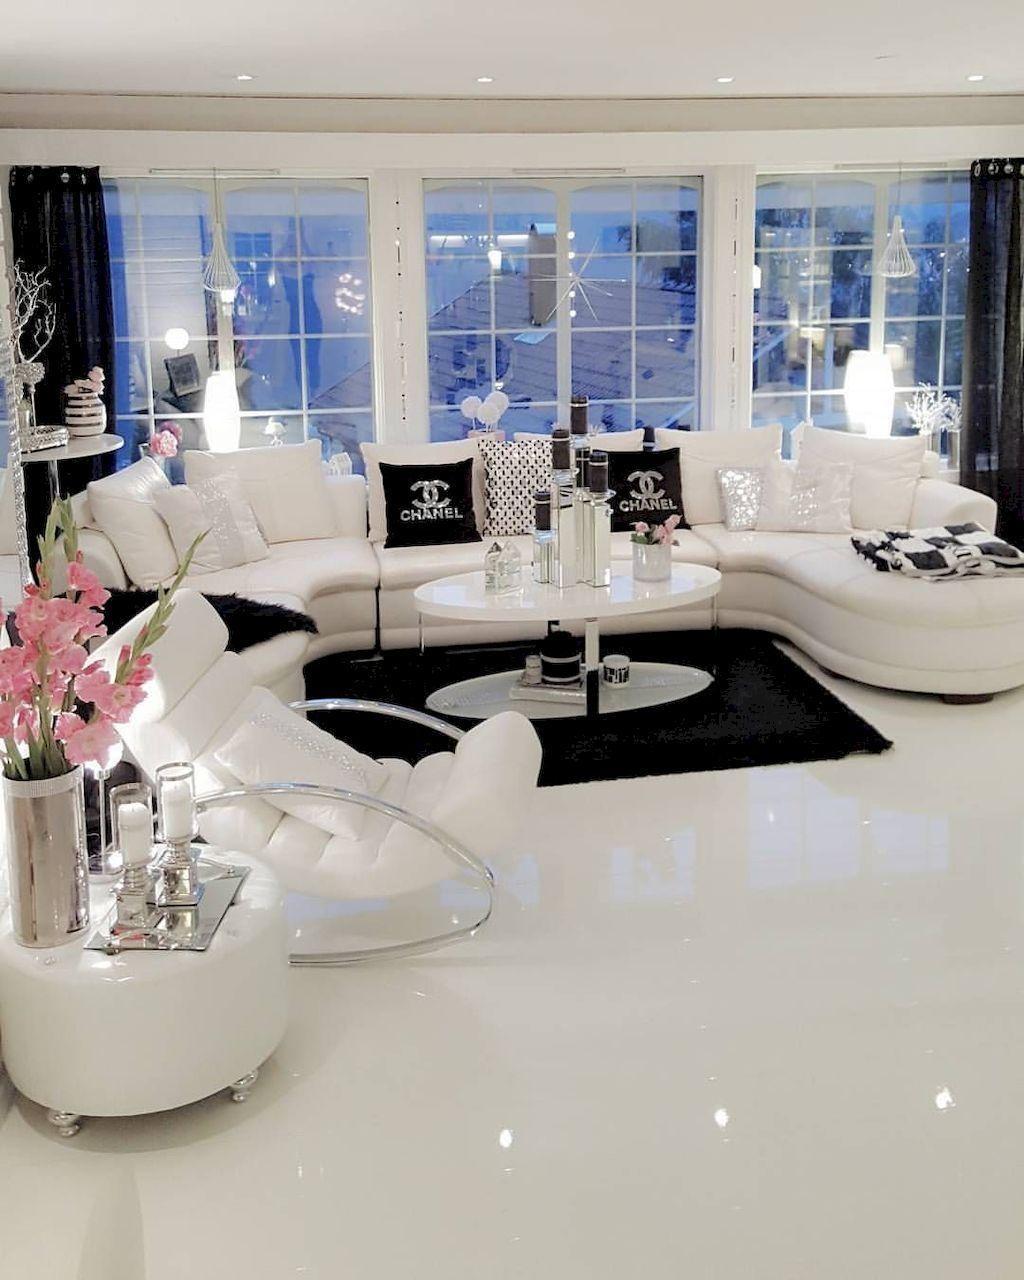 42 Luxury And Elegant Living Room Design Classy Living Room Dream House Decor Dream Living Rooms